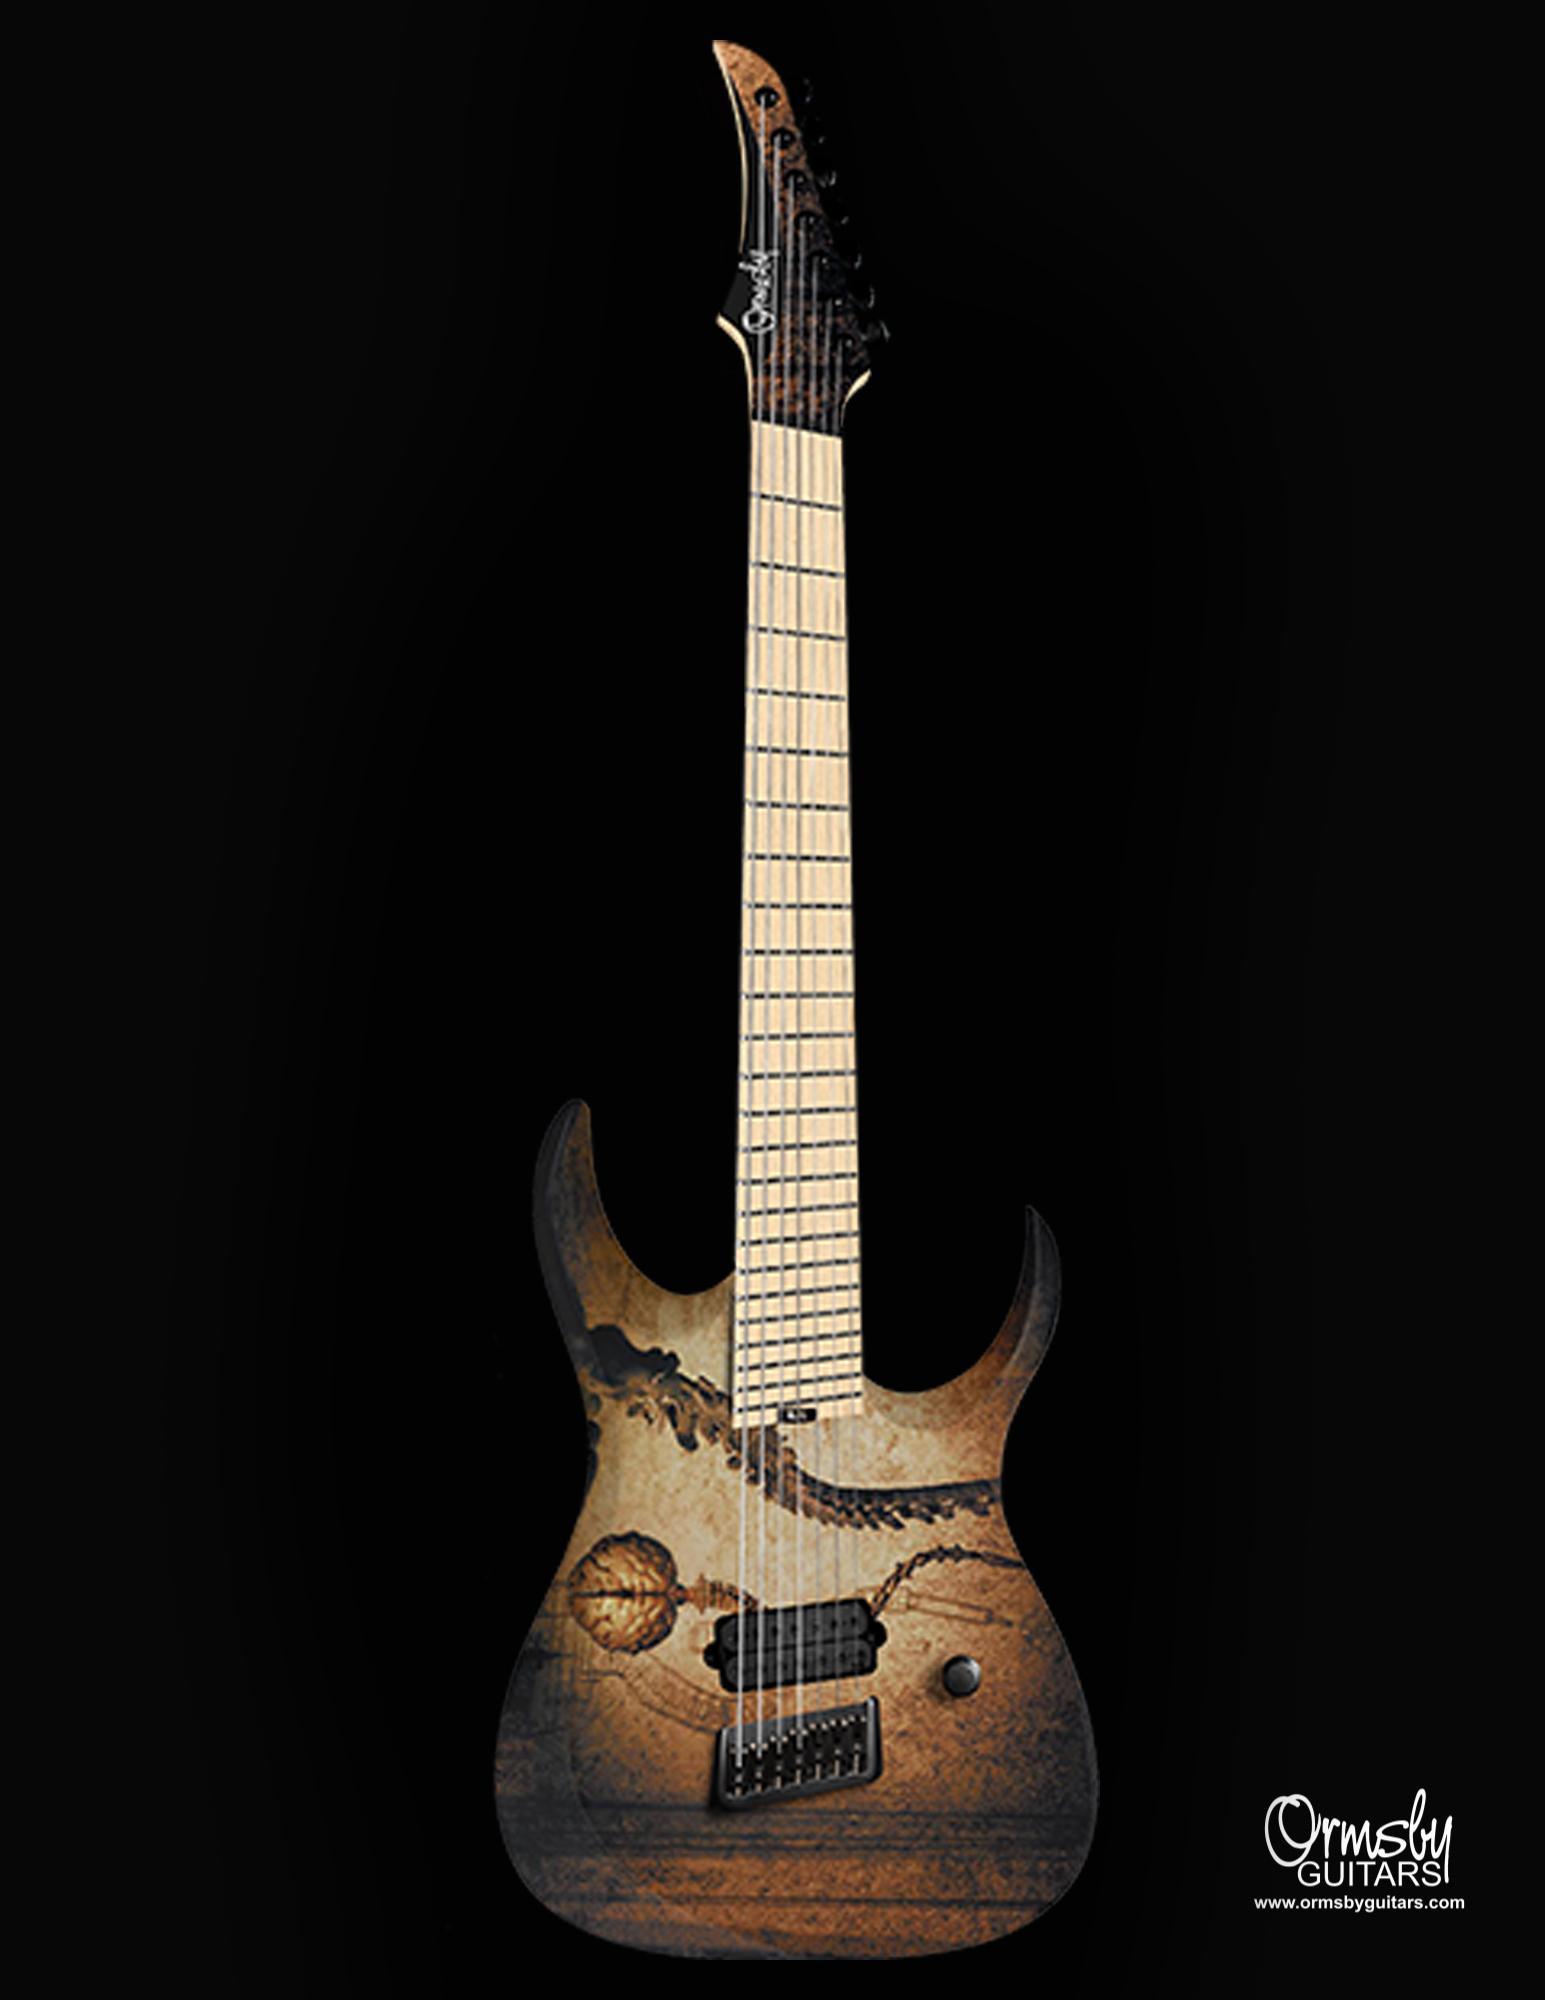 Ormsby Guitars Artists Dino Cazares